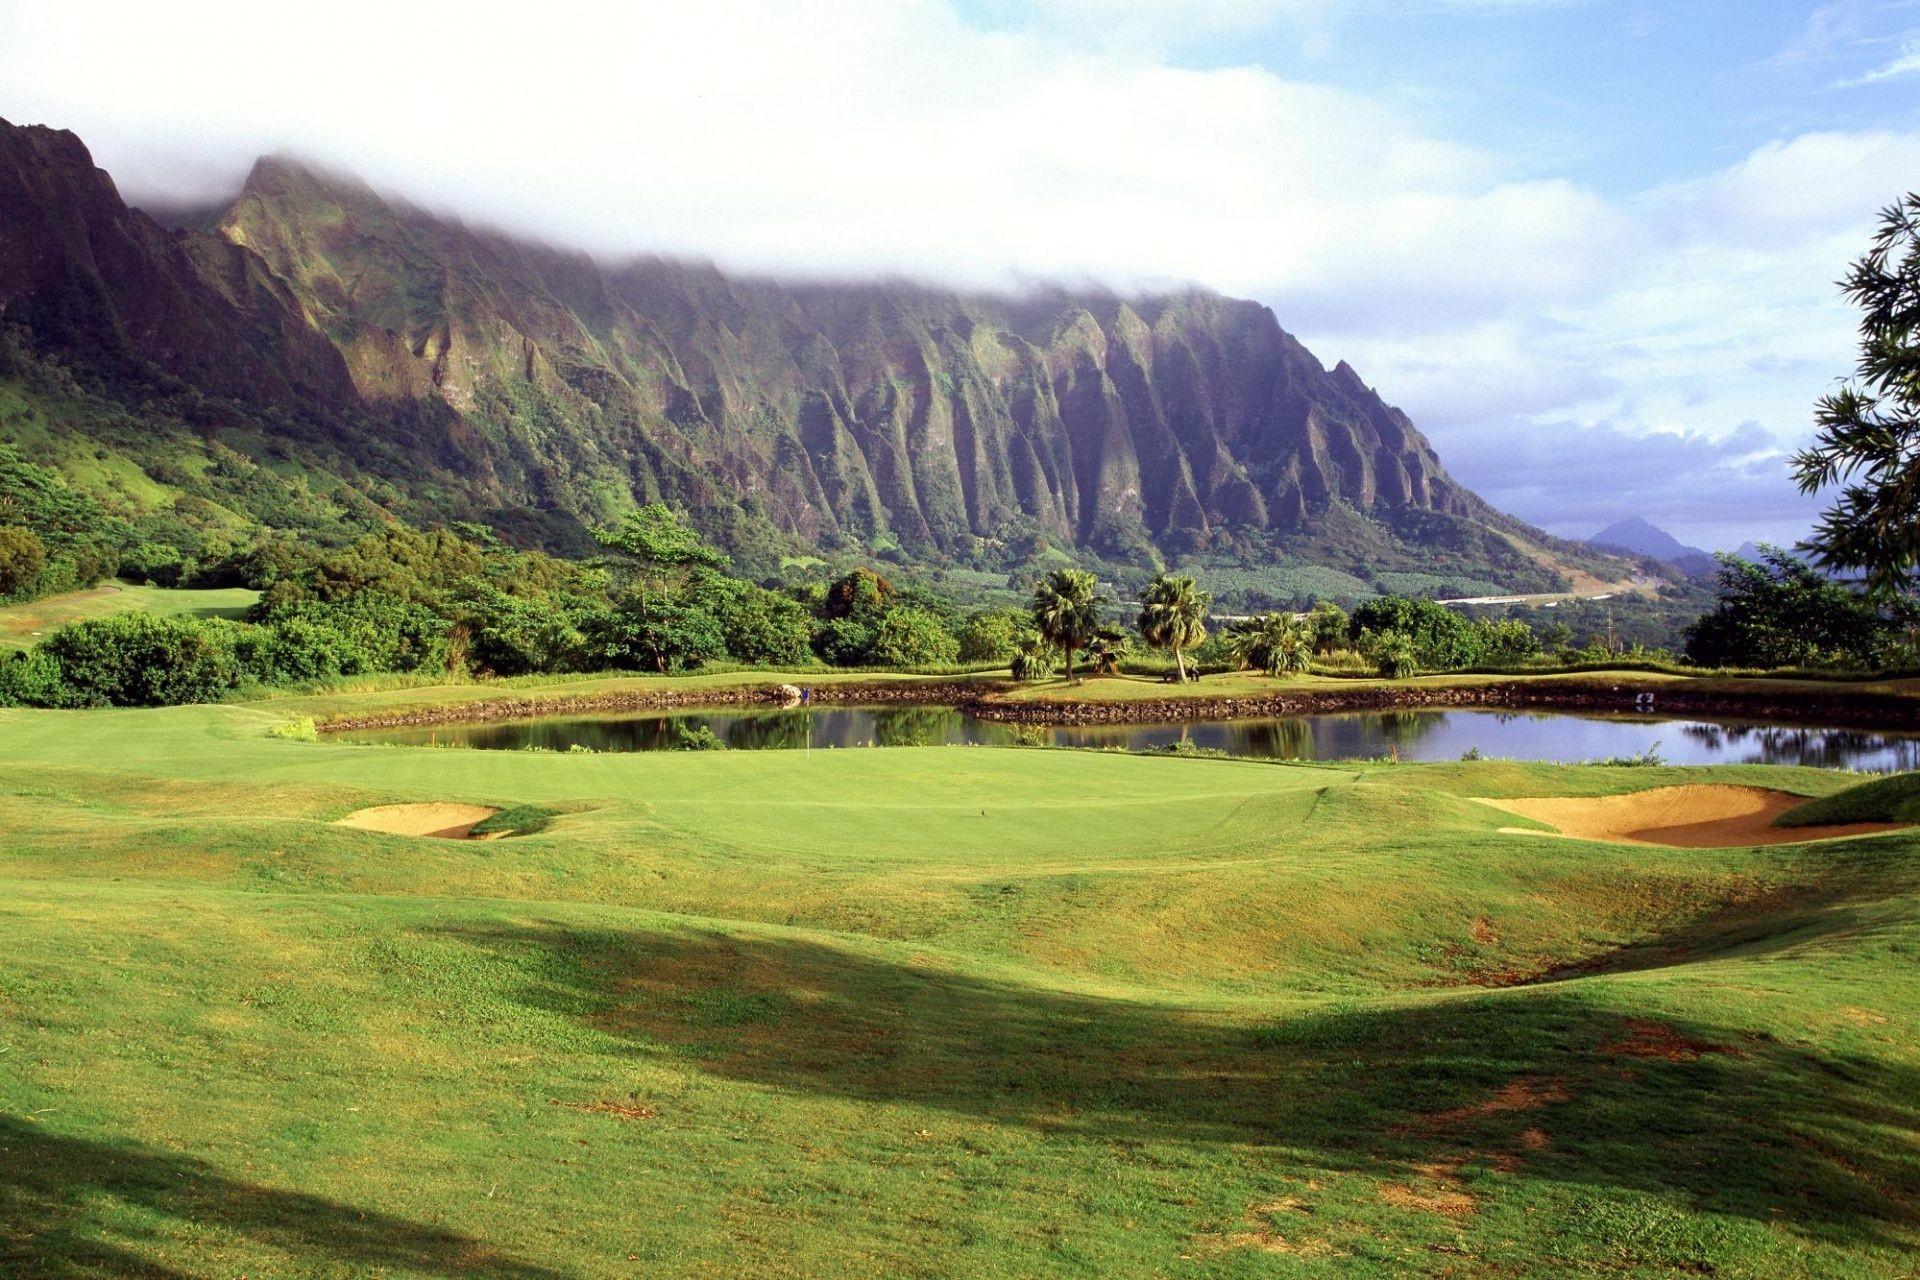 Res: 1920x1280, Golf course